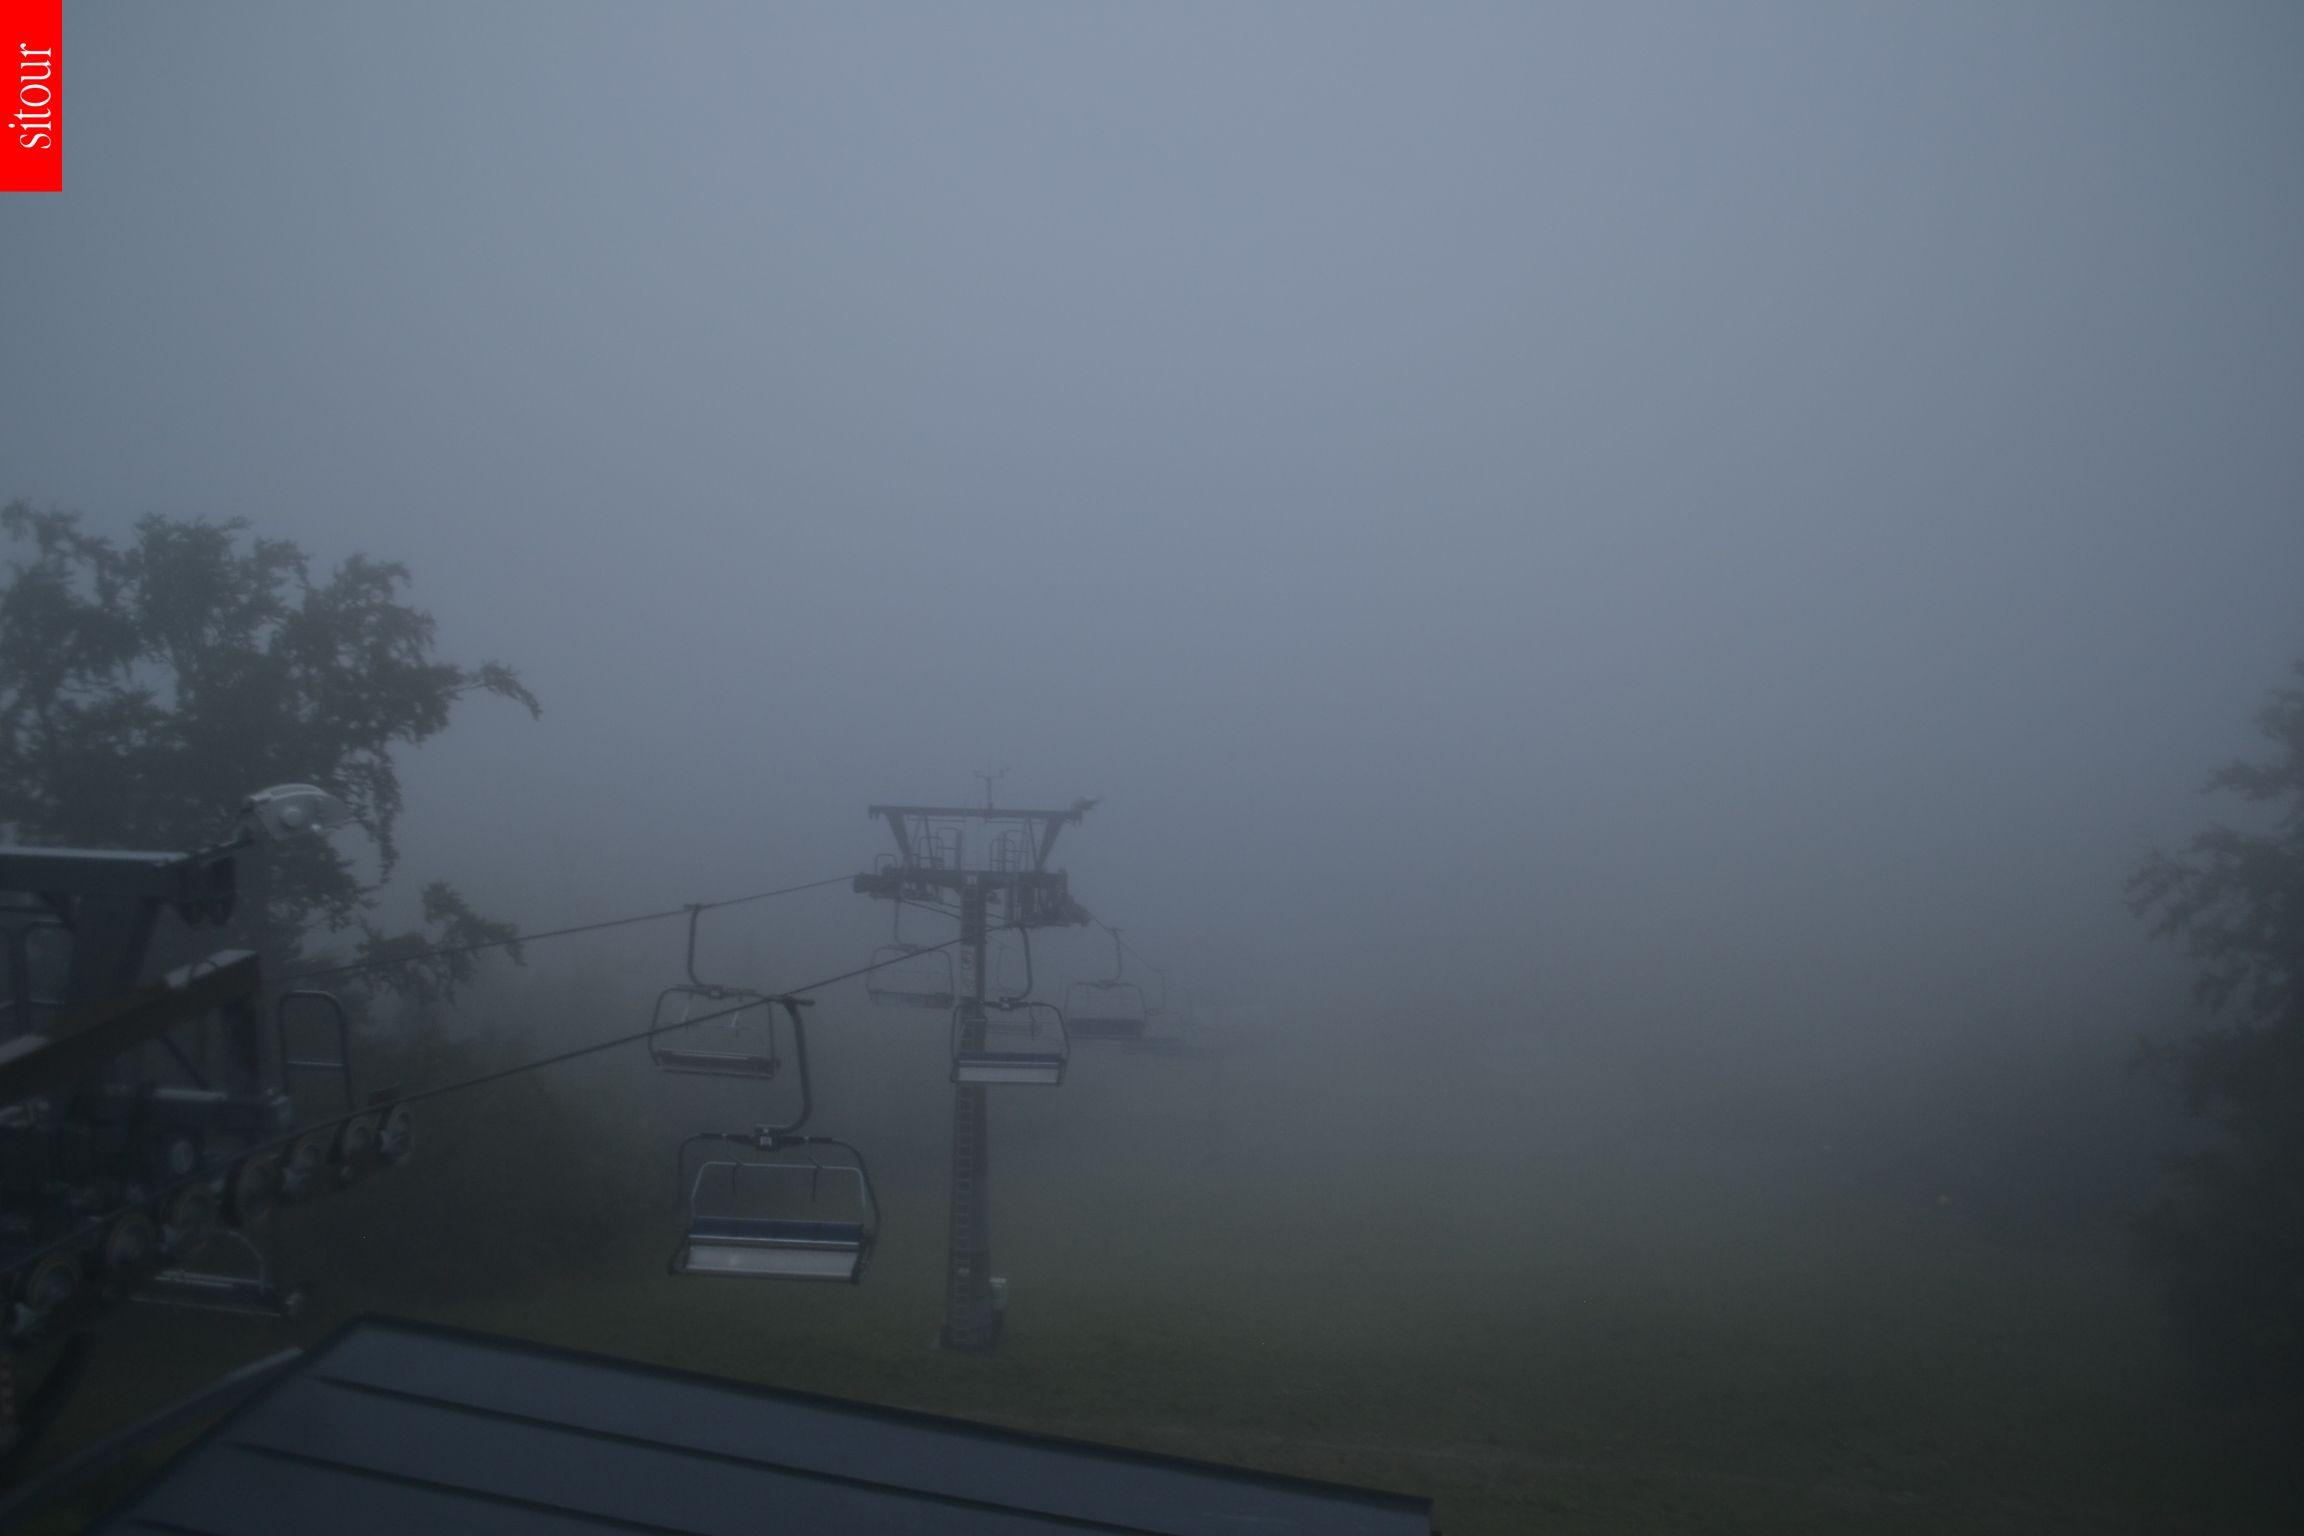 Webcam Ski Resort Benecko Giant Mountains